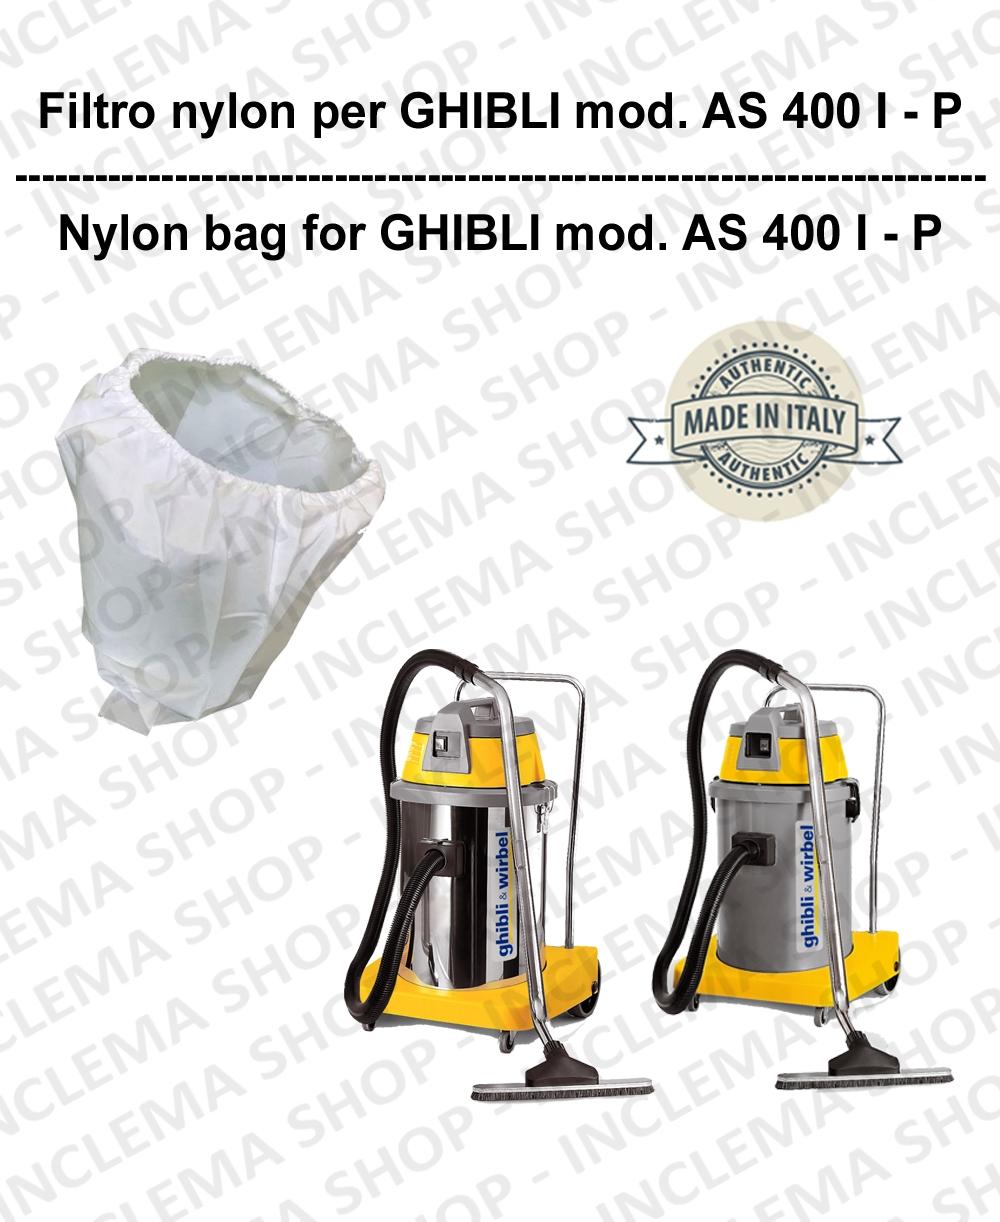 SACCO Filtro de Nylon cod: 3001215 para aspiradora GHIBLI Model AS400